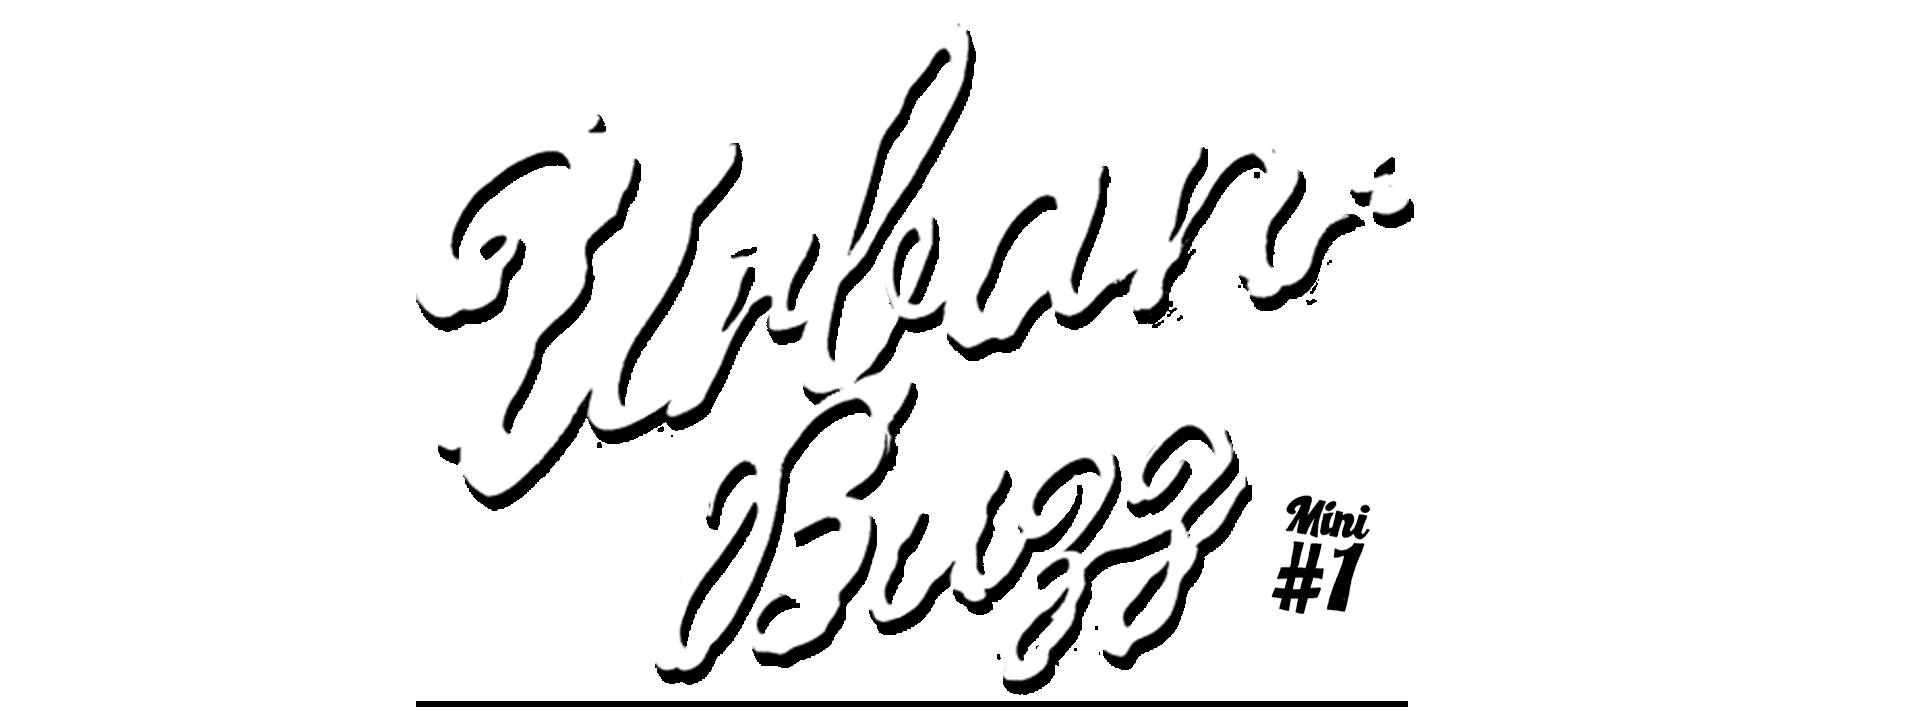 Urban Buzz Mini #1